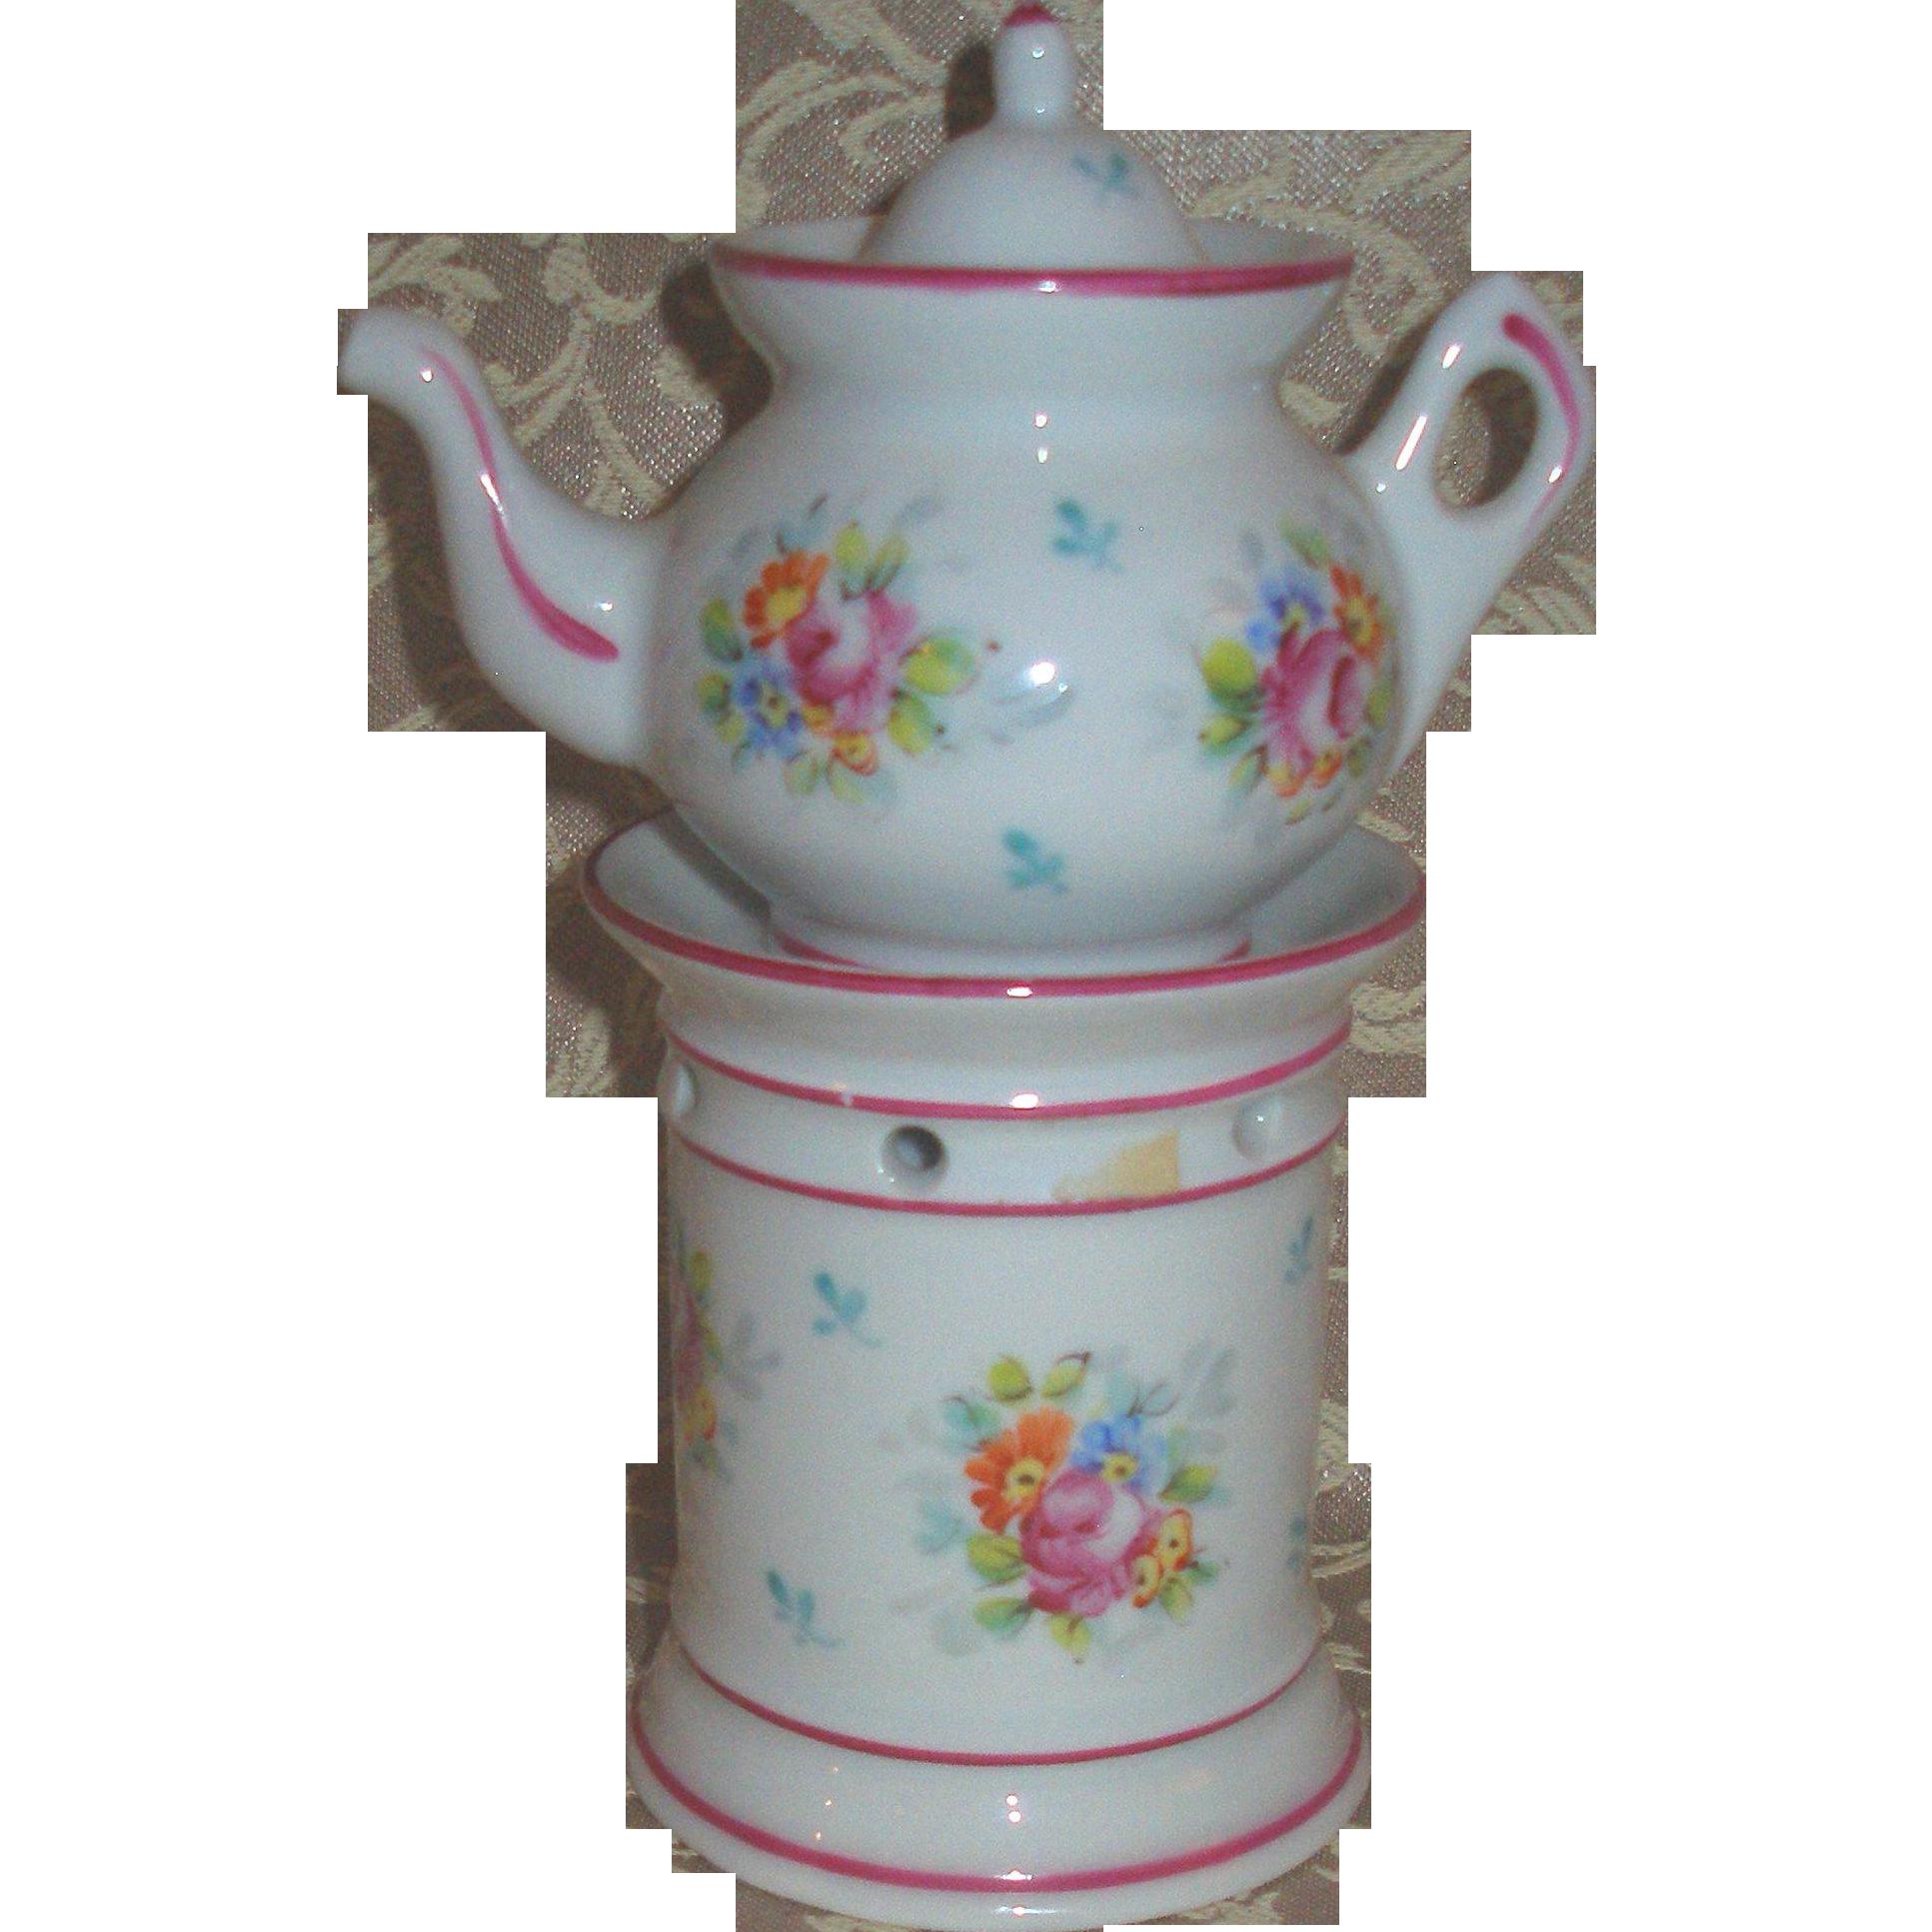 Porcelaine de Paris Rose Veilleuse for Your French Doll!